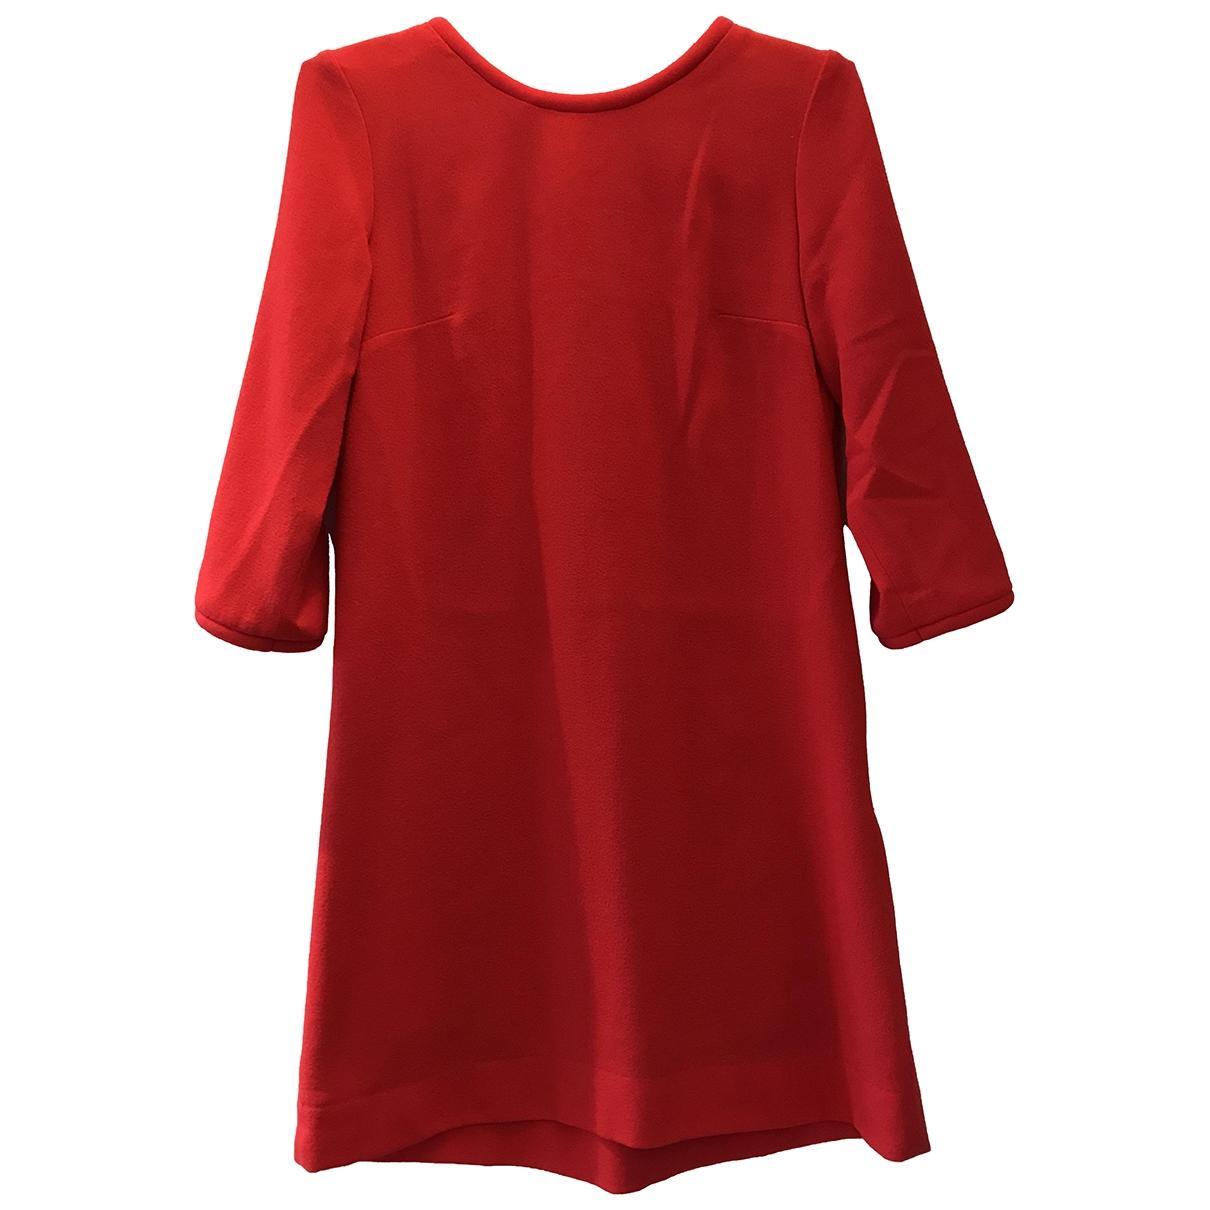 Goat \N Red Wool dress for Women 6 UK